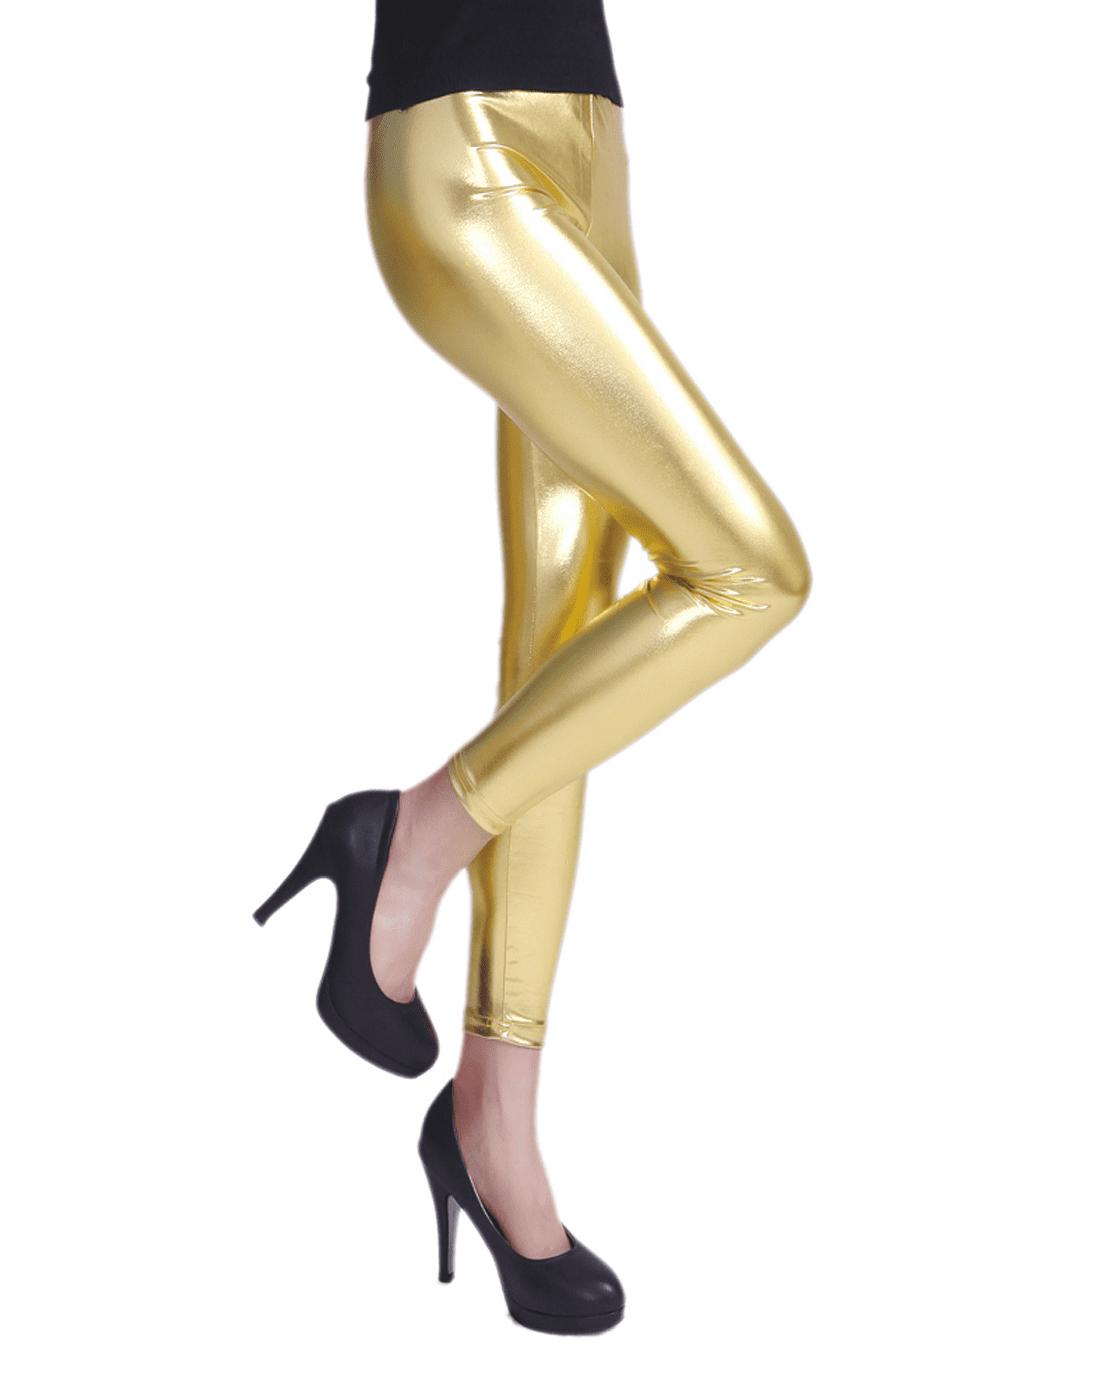 d90e063d3e HDE Women Shiny Liquid Wet Look Metallic Stretch Leggings (Small,  Holographic)